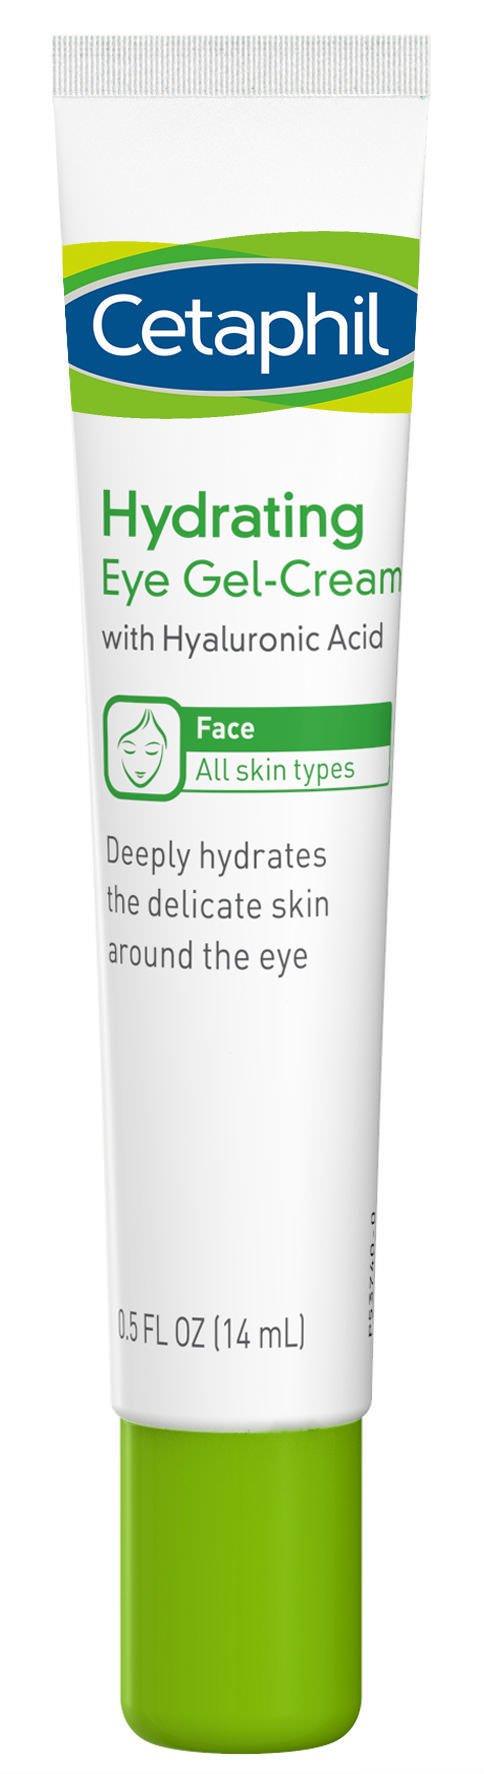 Babor - Skinvoage PX Sensational Eyes Anti-Wrinkle Eye Cream - 15ml/0.5oz Firm Skin Acai Moisturizer-60ml/2oz